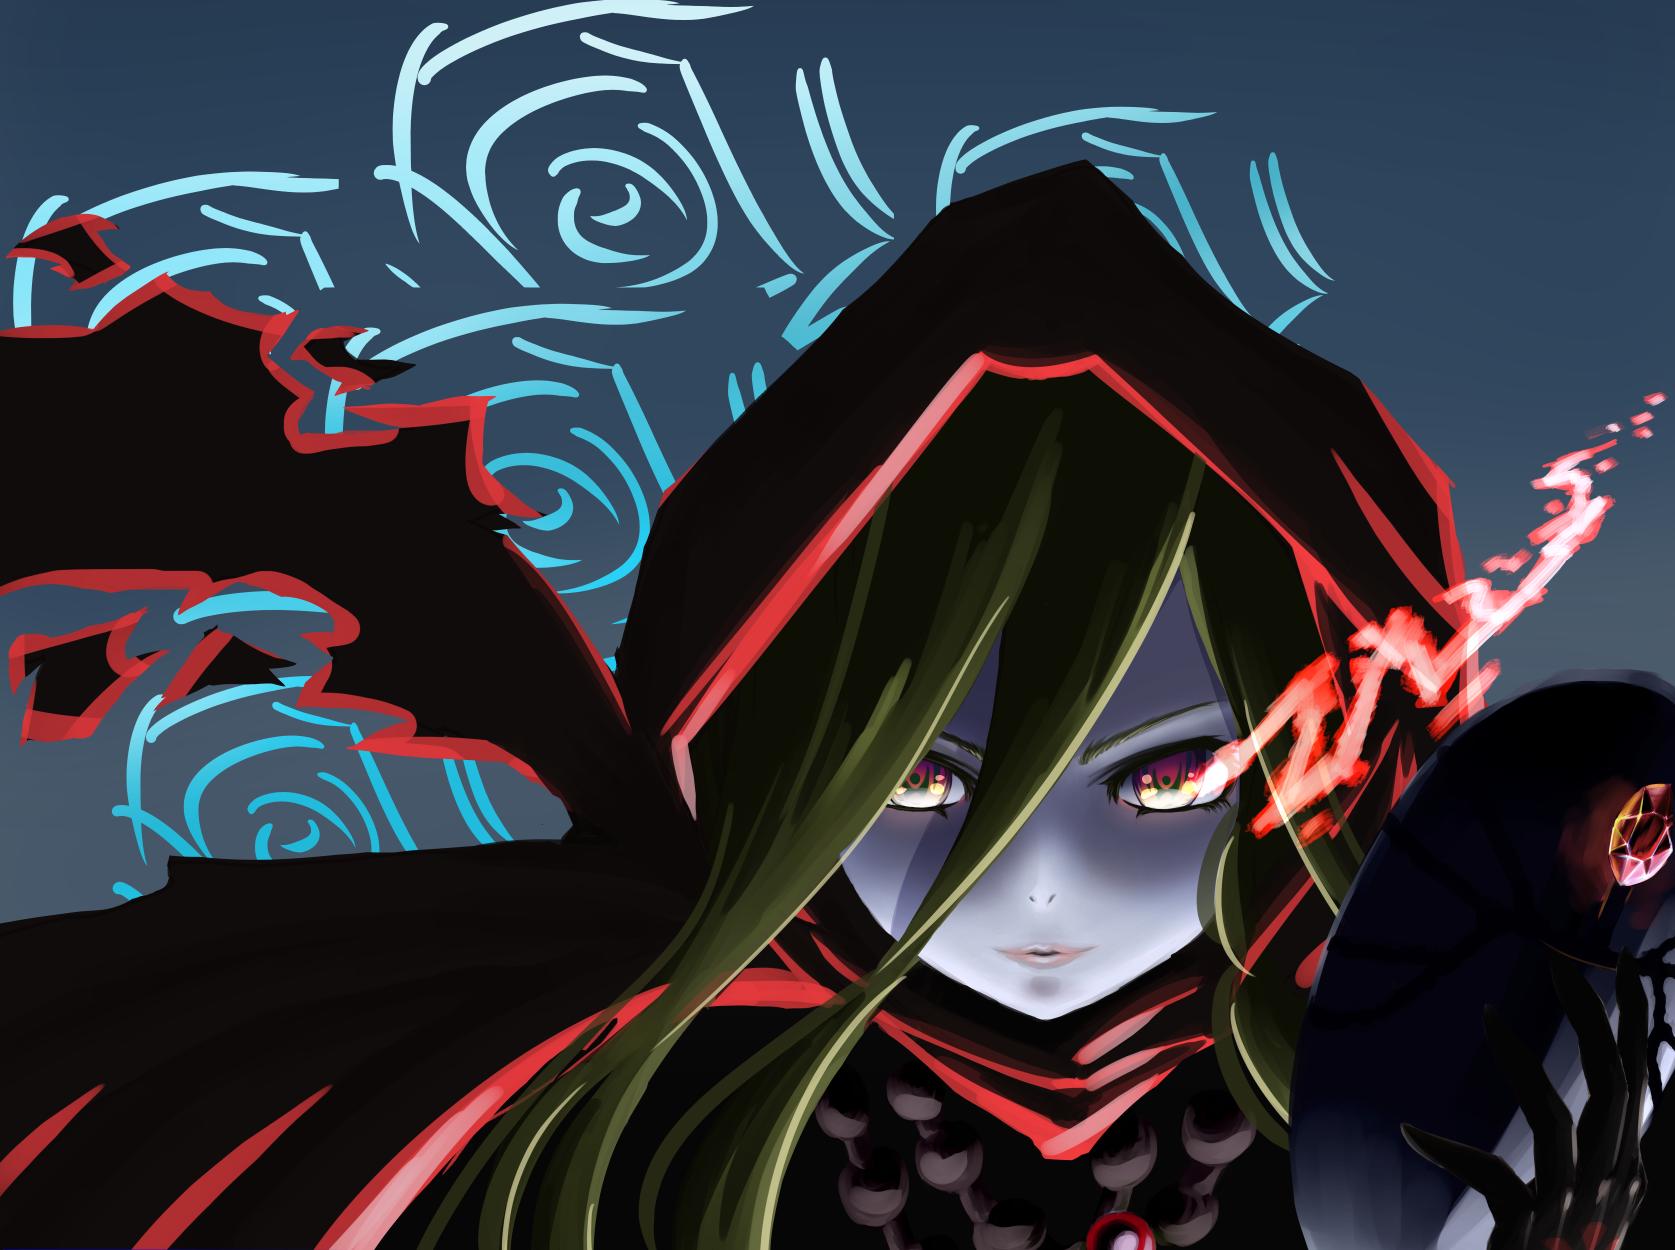 Pin By Sakuranokami On Overlord Anime Romance Anime Character Art